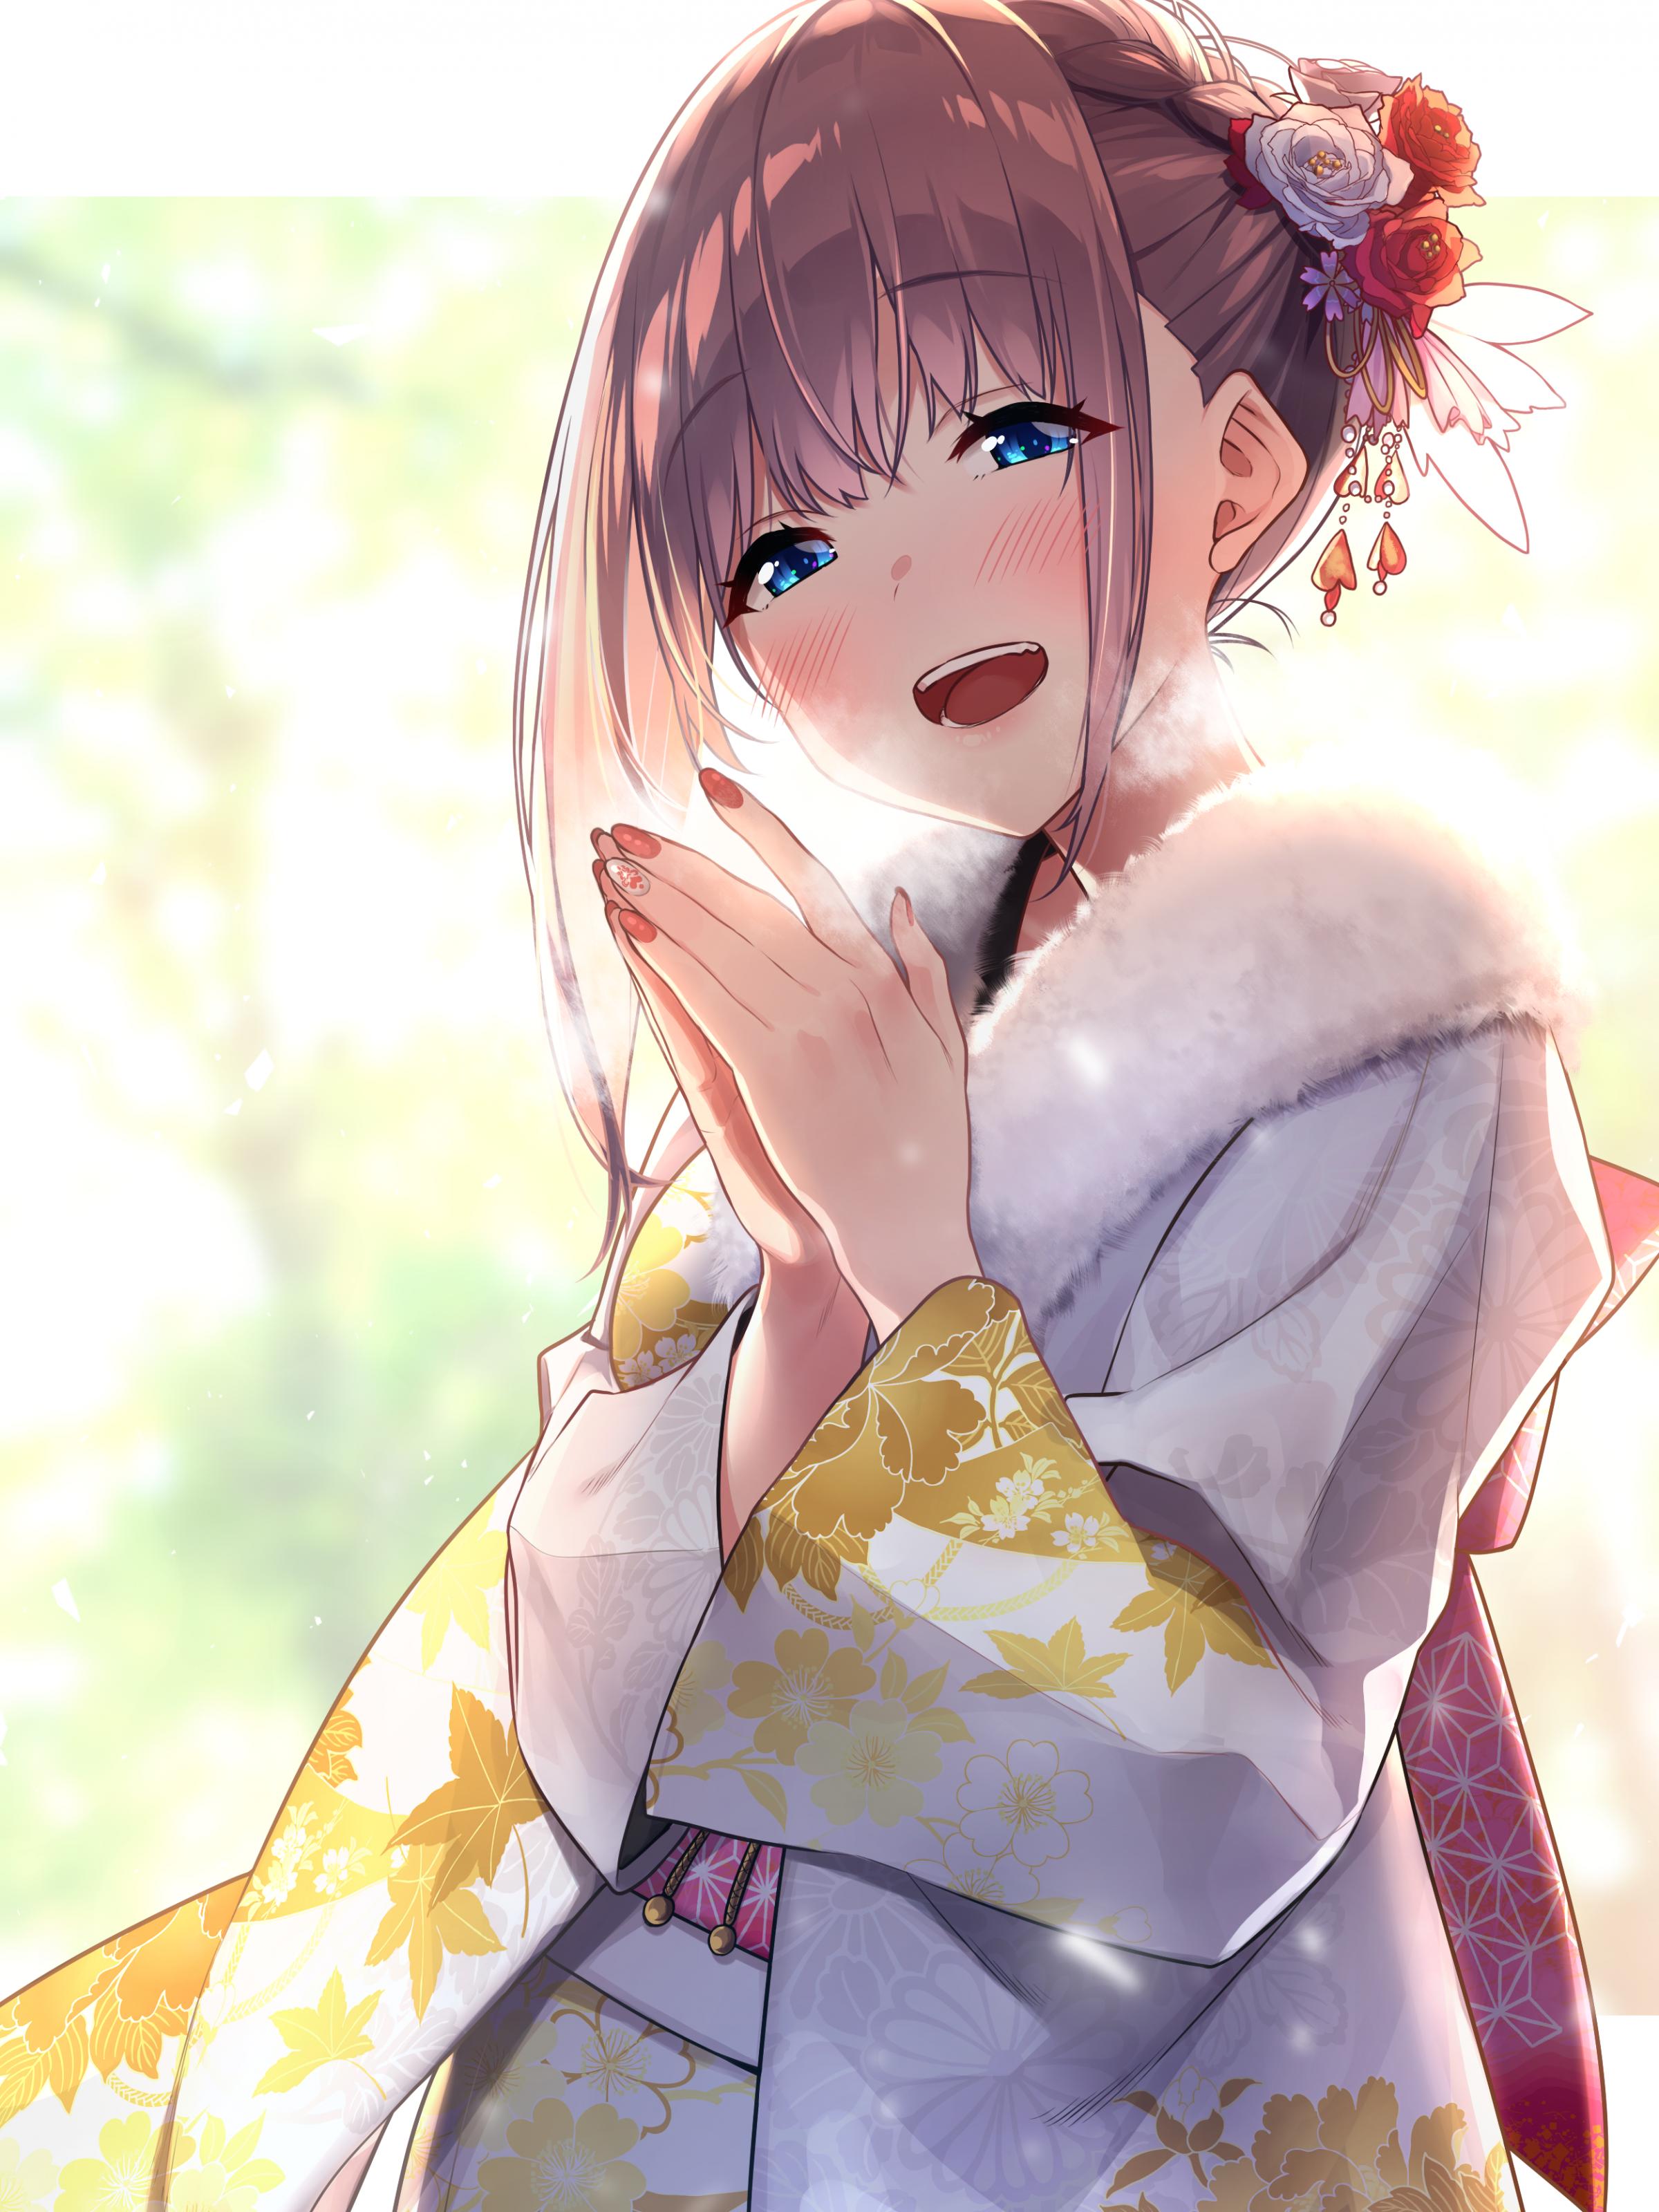 Download 2400x3200 Kimono Brown Hair Anime Girl Smiling Happy 2400x3200